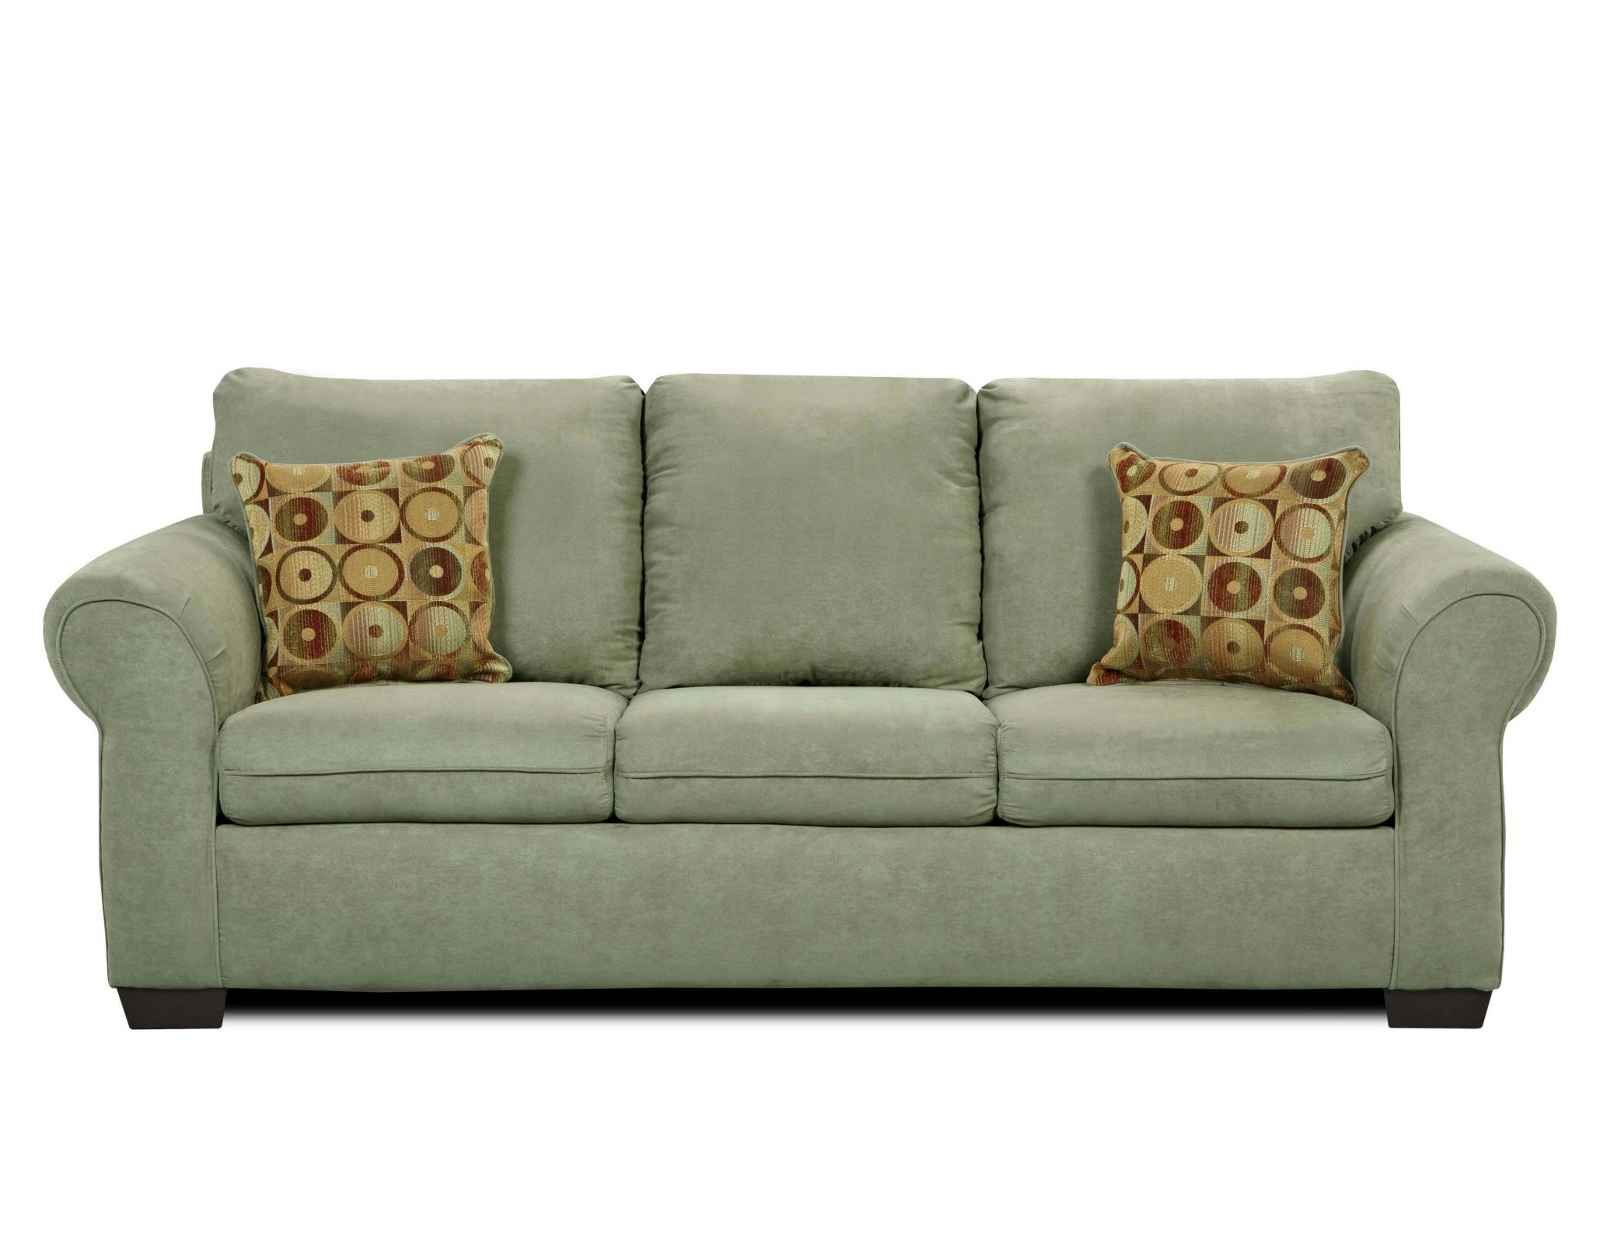 Cheap Sofa And Loveseat Sets